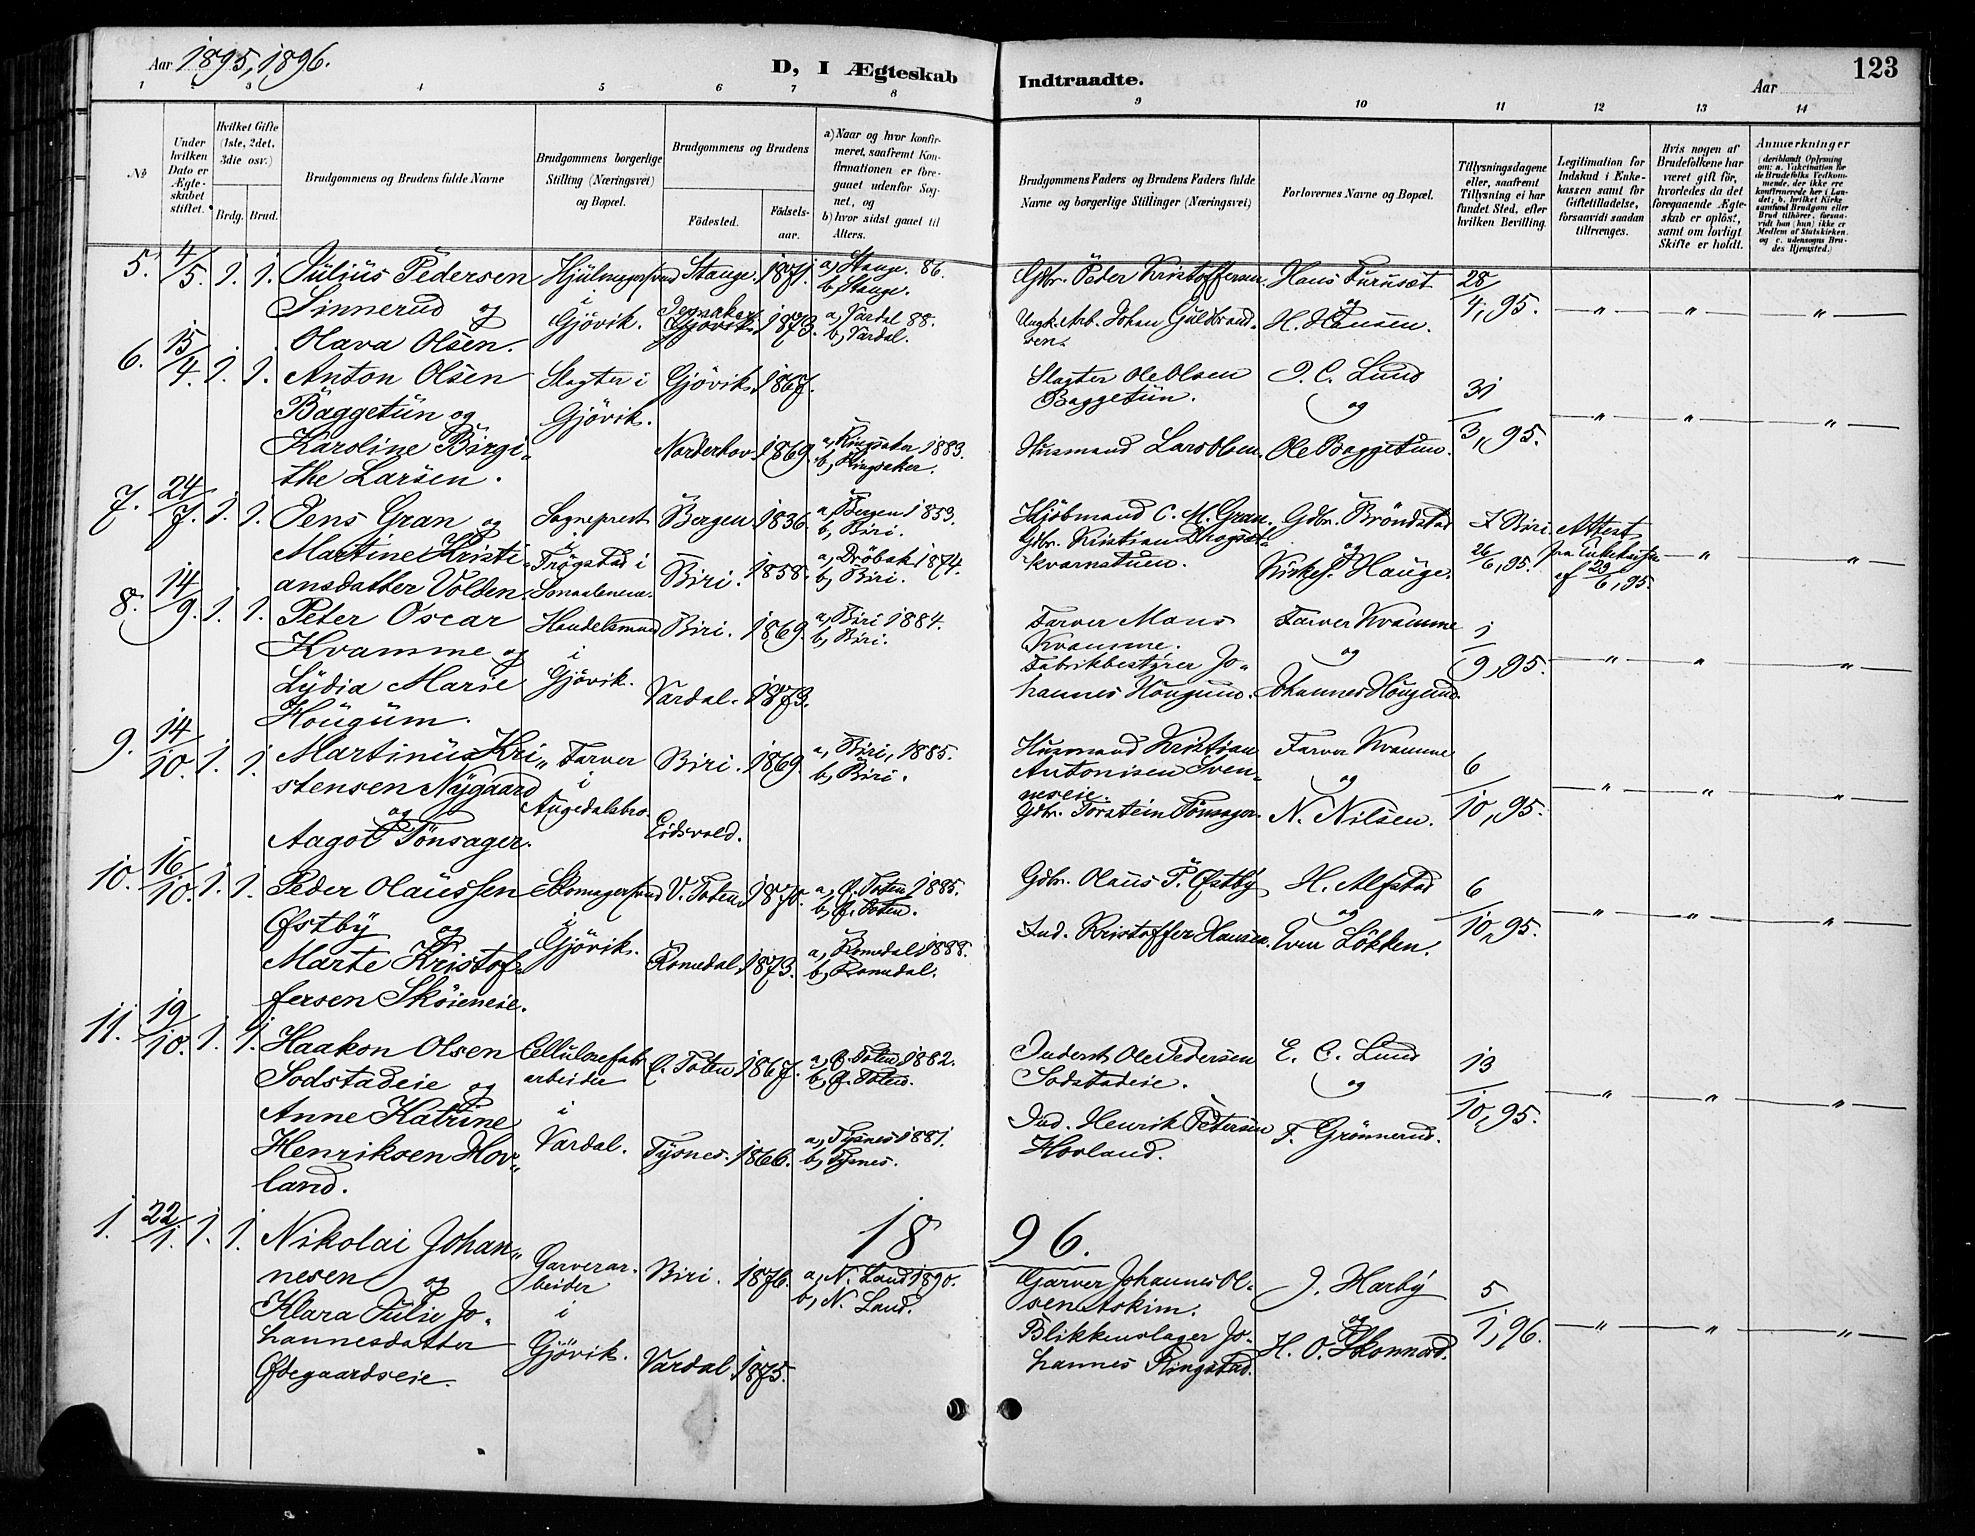 SAH, Vardal prestekontor, H/Ha/Haa/L0011: Ministerialbok nr. 11, 1891-1901, s. 123